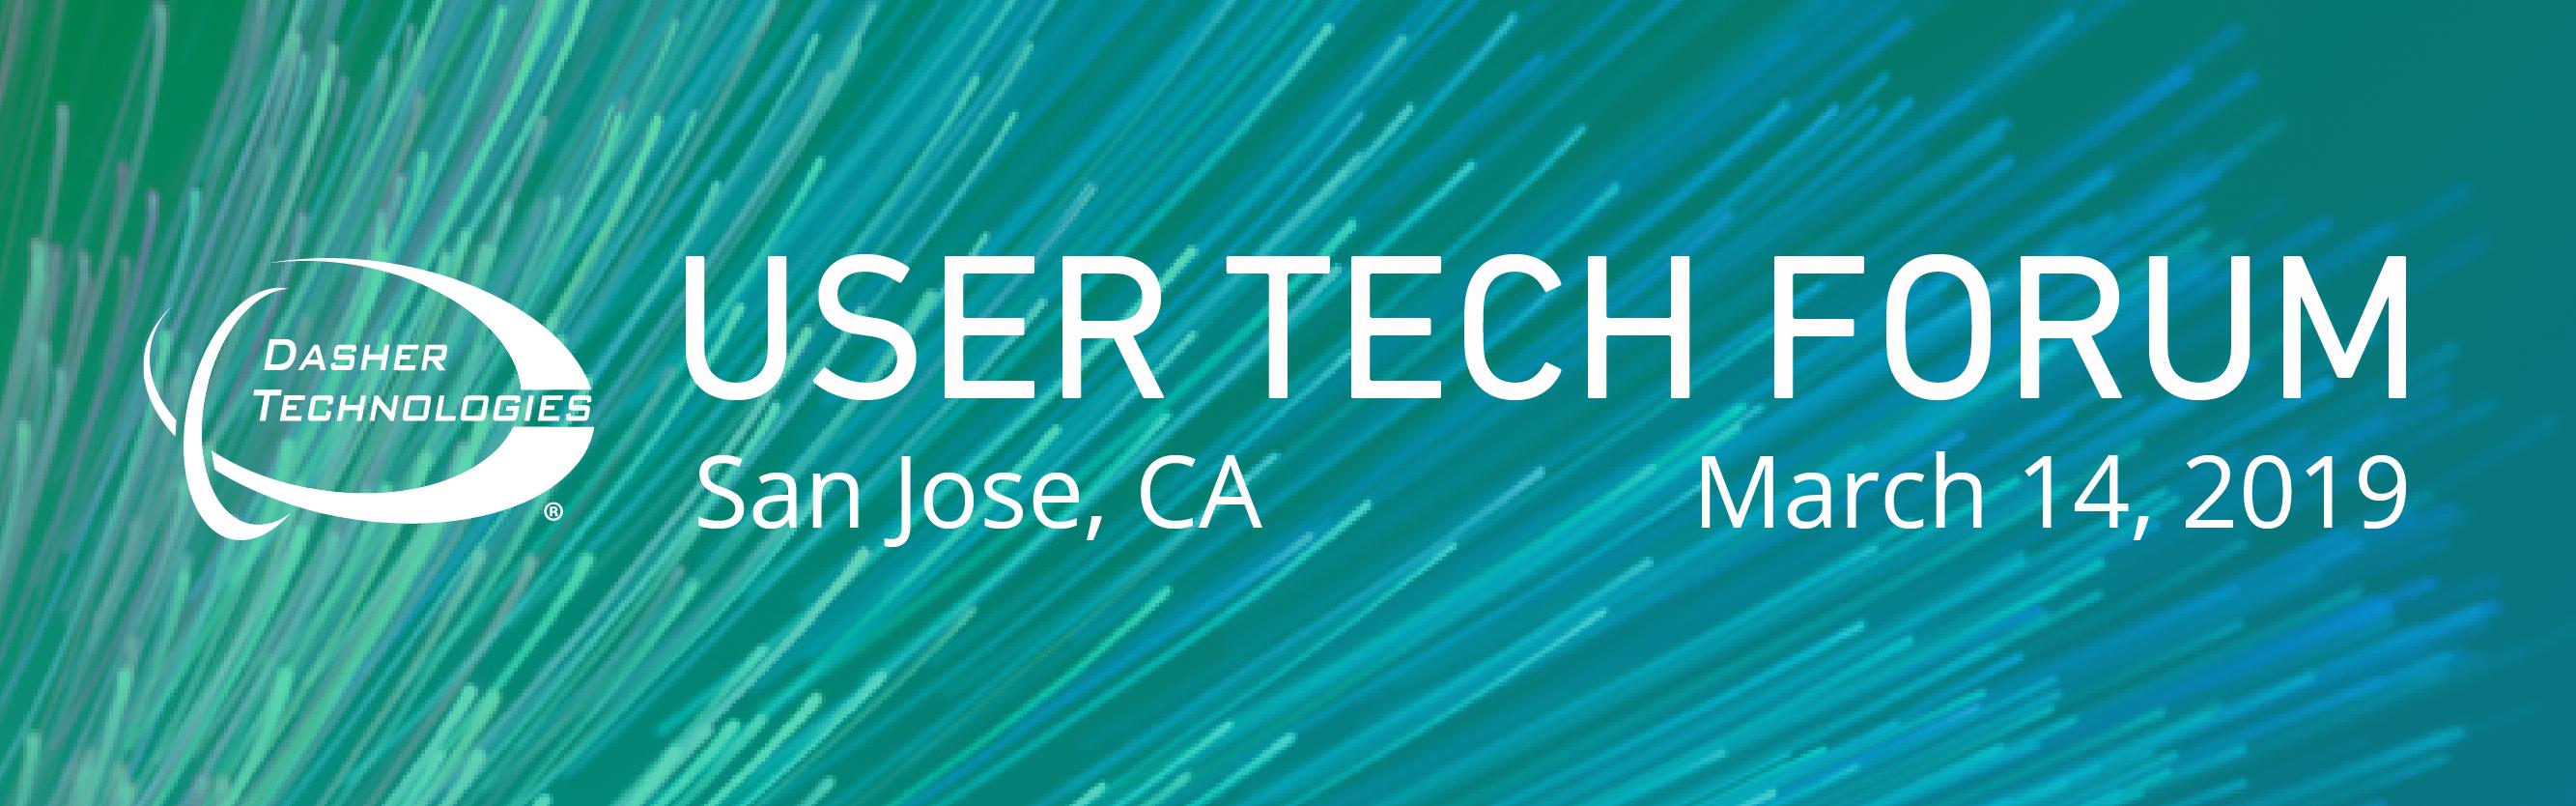 User Technology Forum 2019 – San Jose, CA